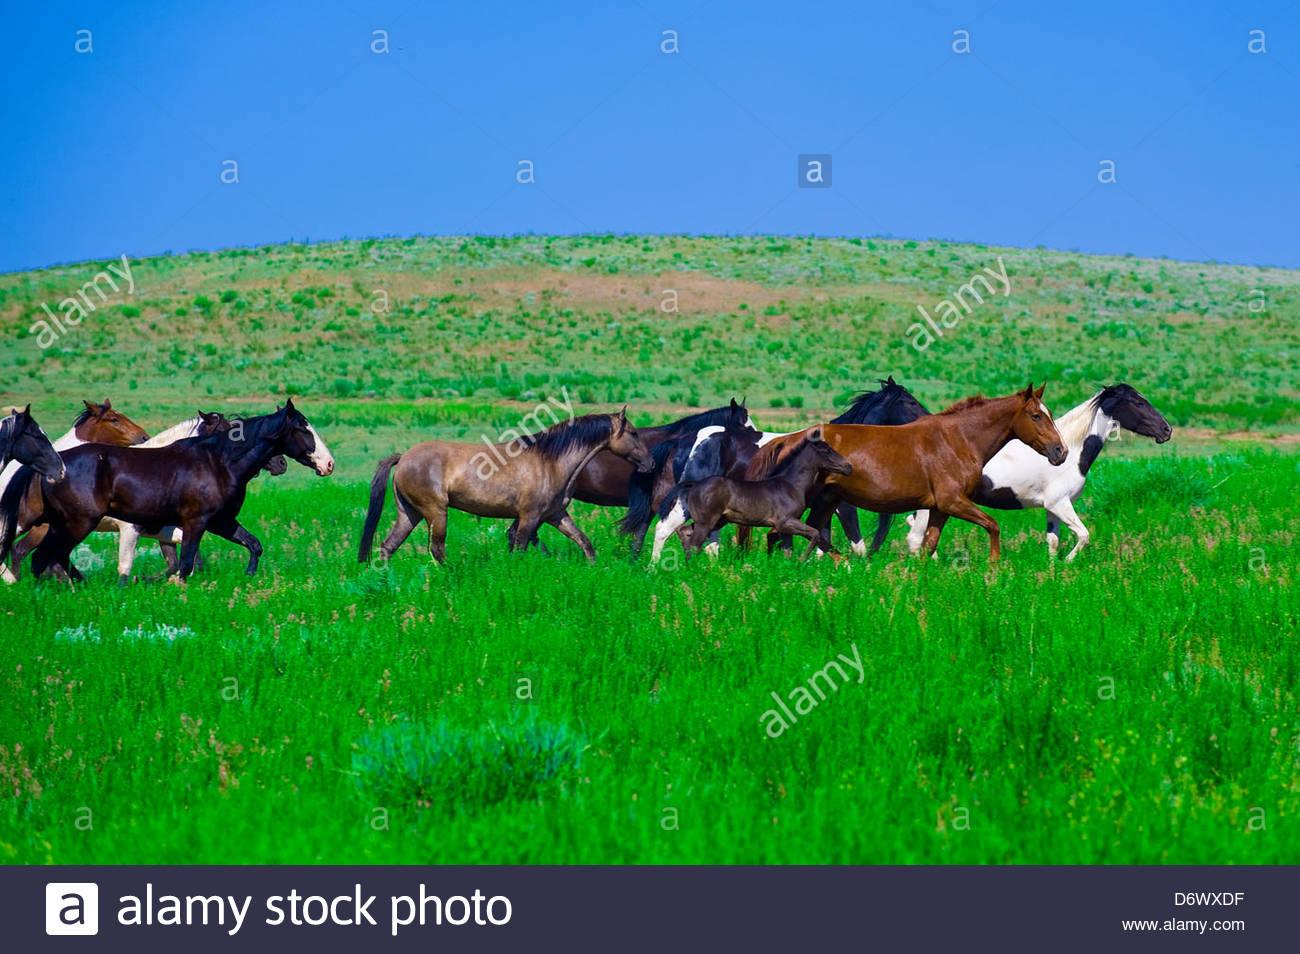 Mustang Horse Running Stock Photos Amp Mustang Horse Running